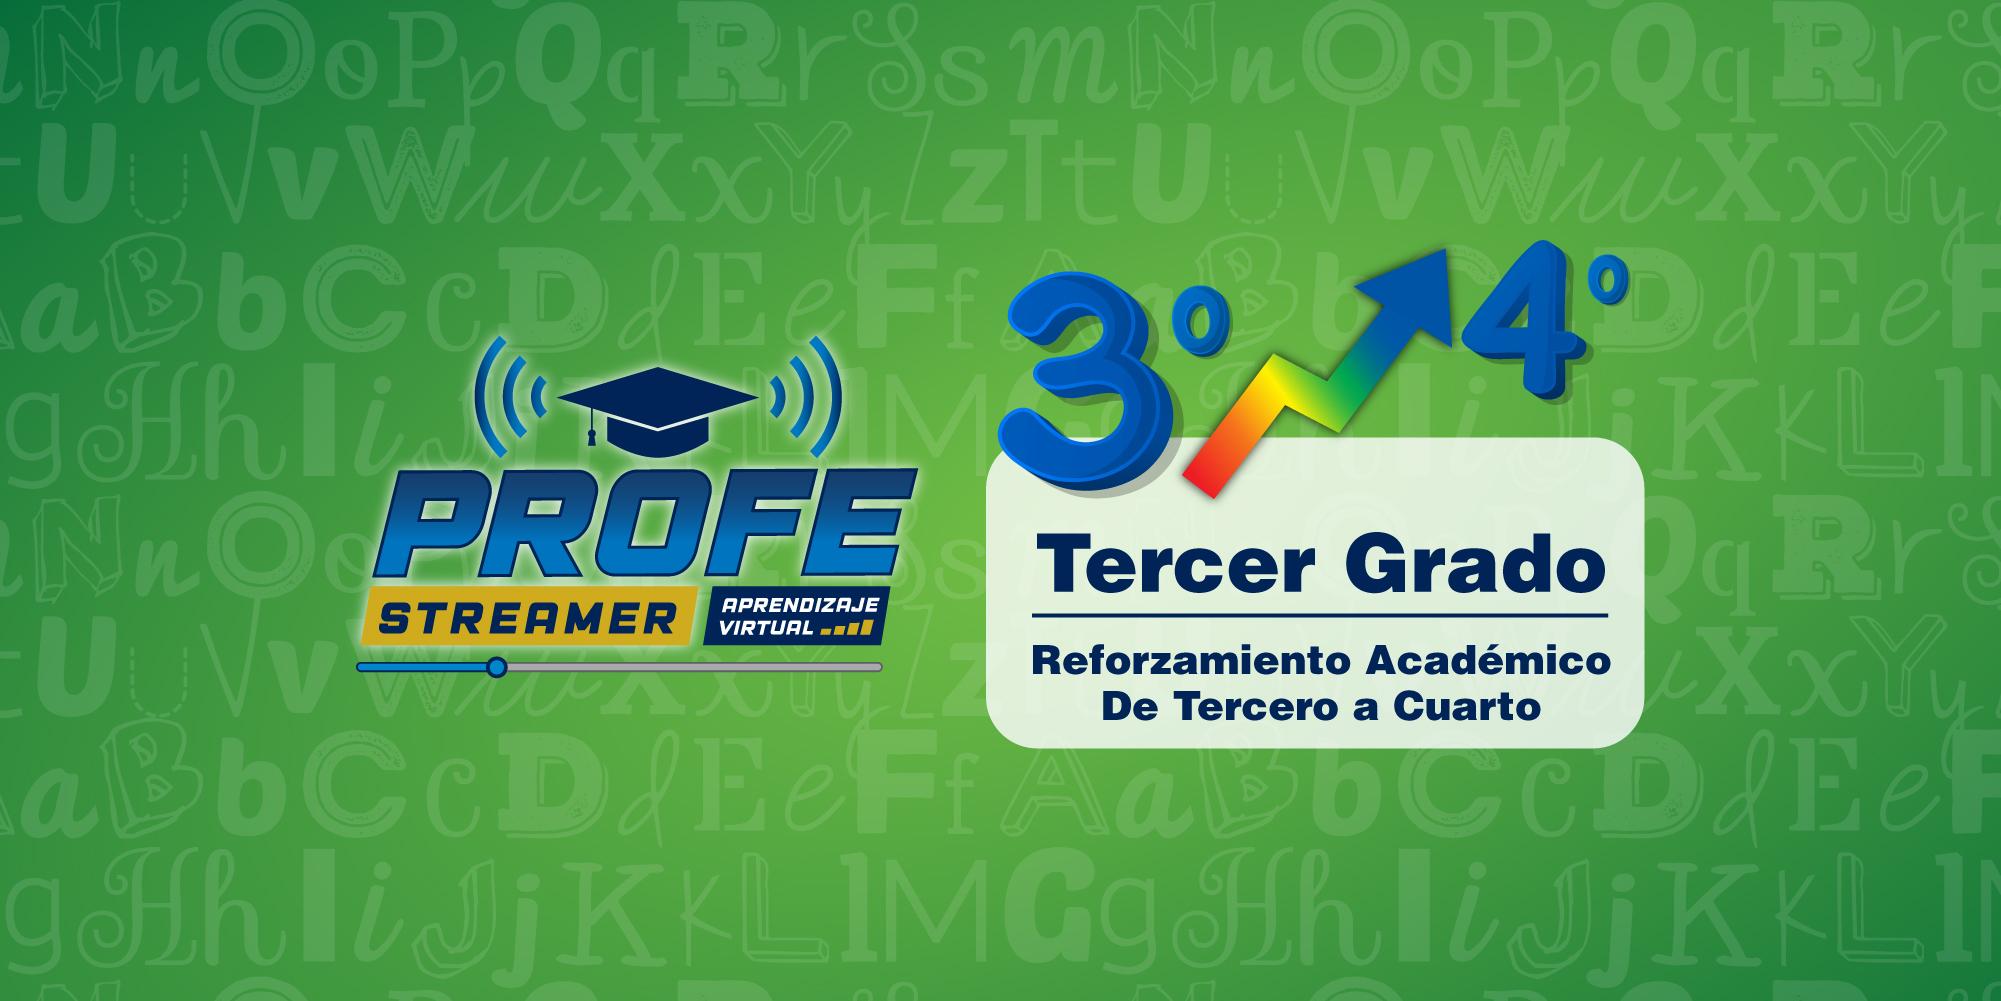 Transición de Tercer a Cuarto Grado – Curso de Reforzamiento Académico